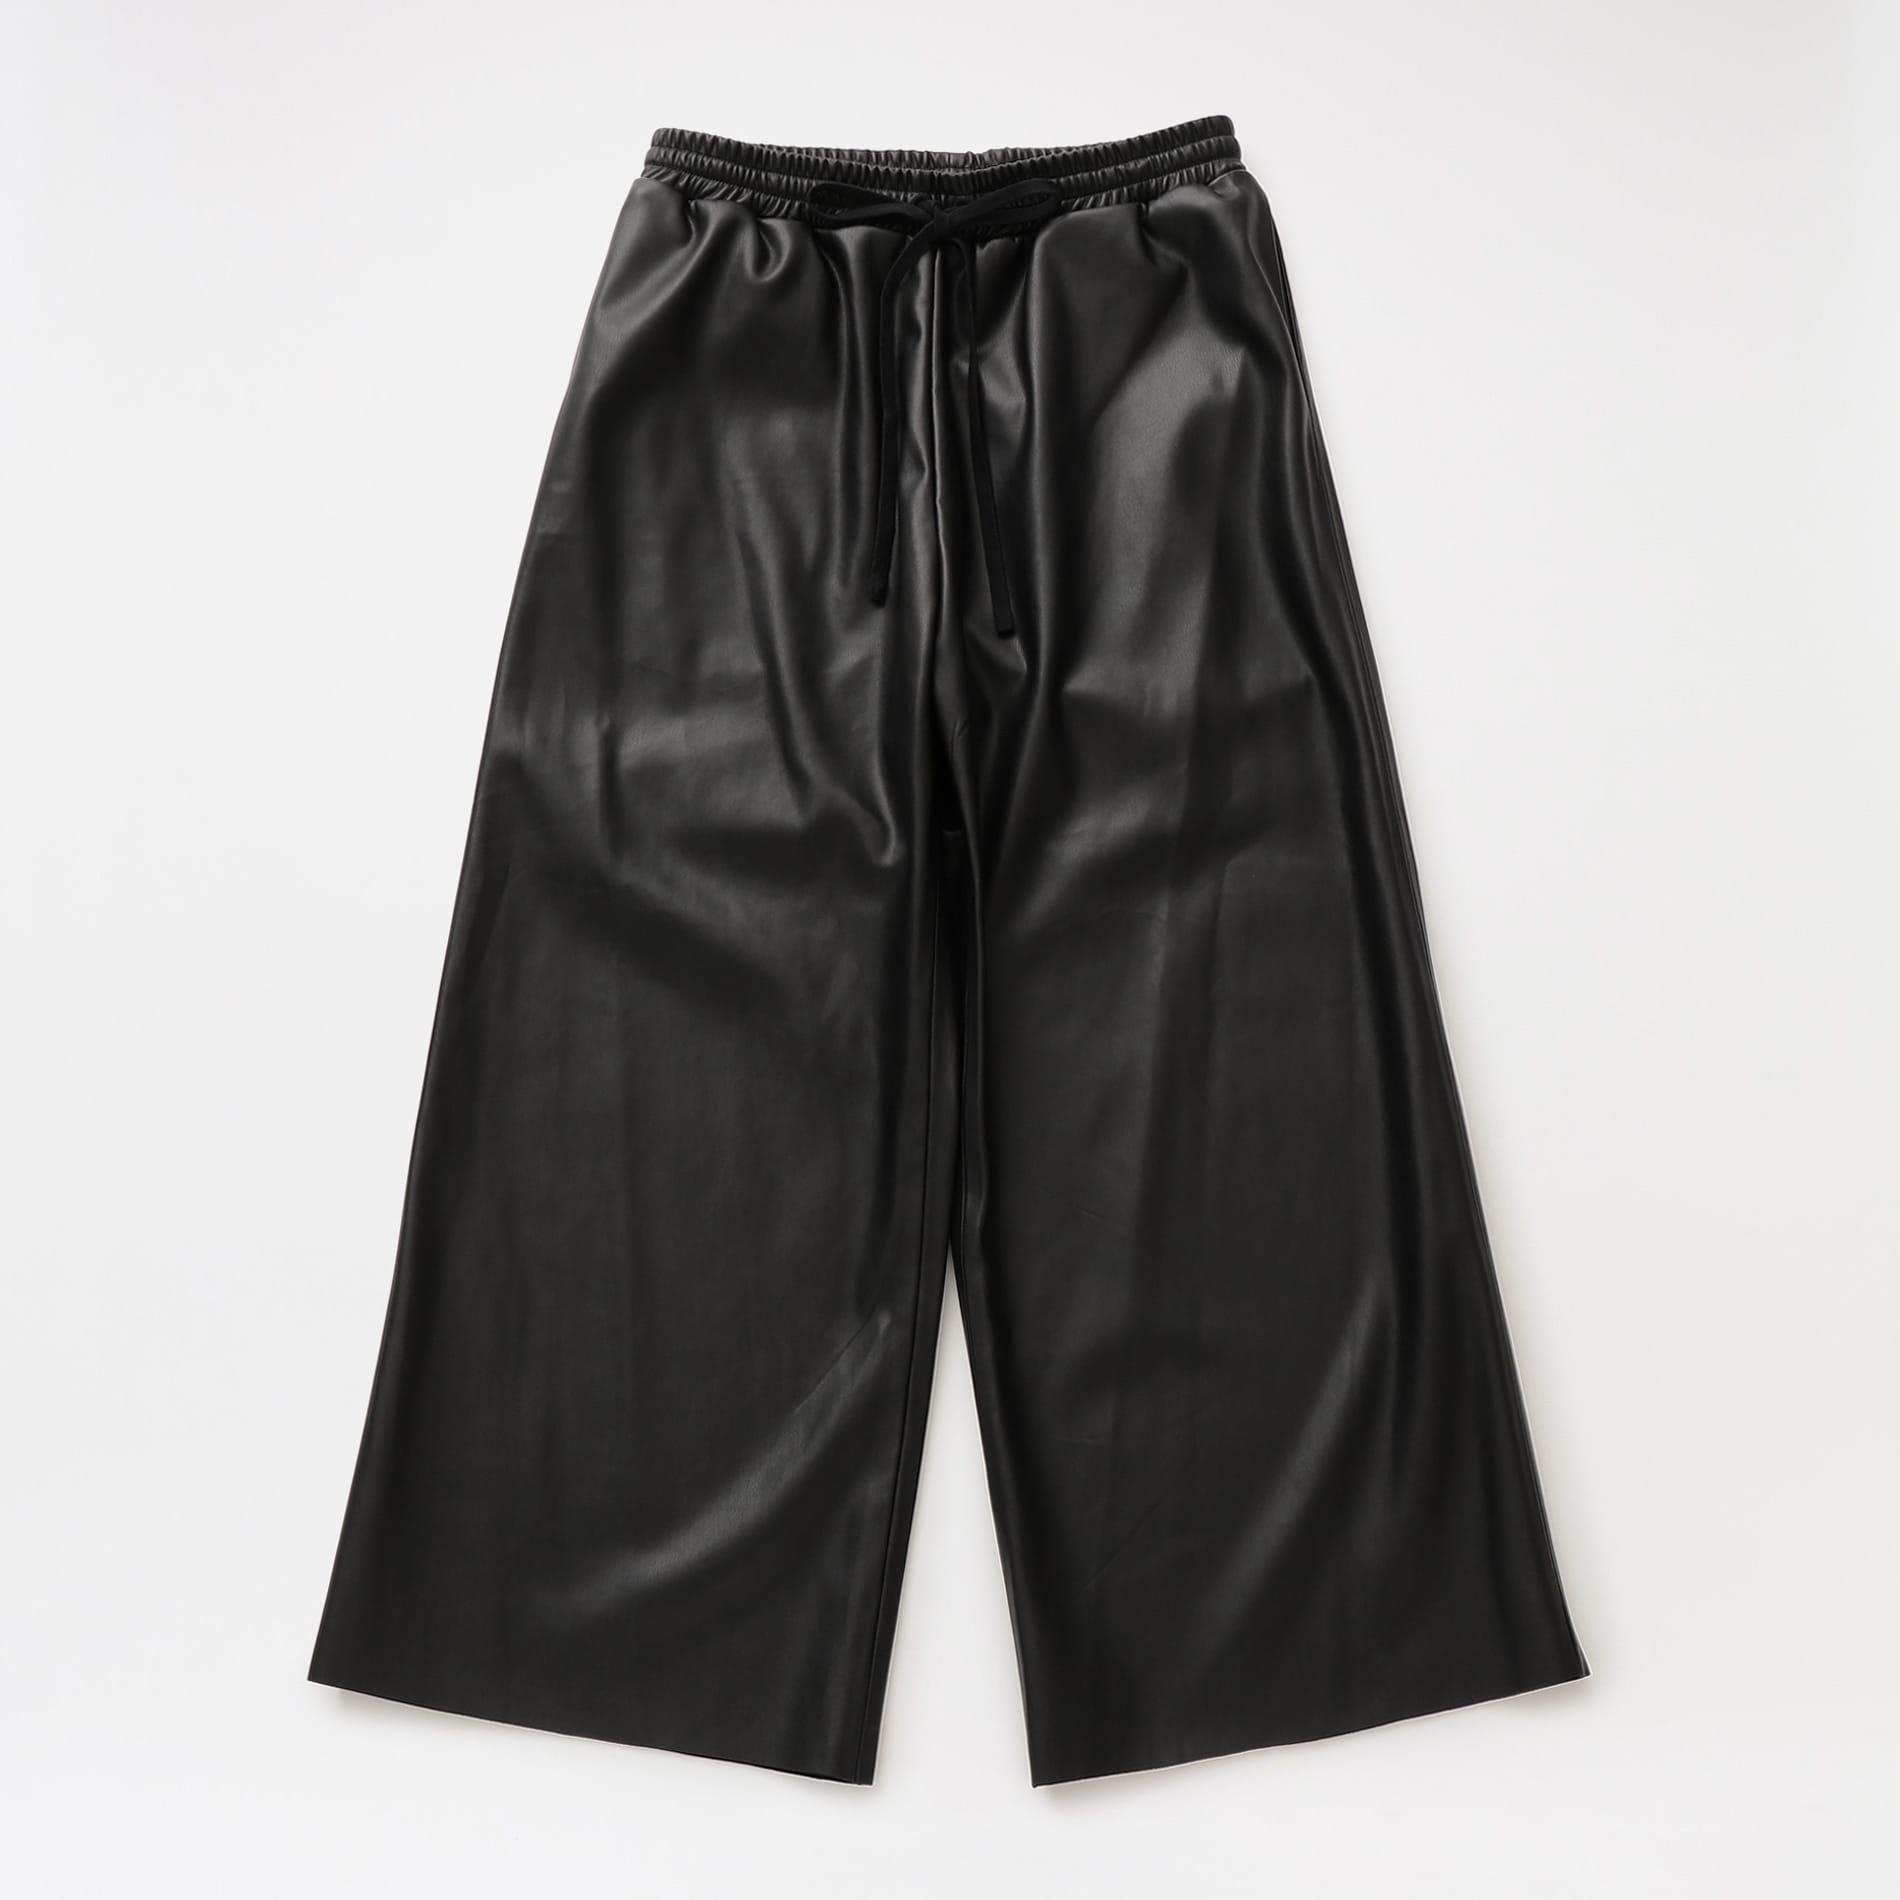 【MELITTA BAUMEISTER】WOMEN LOUNGE PANTS MB-37-20FW